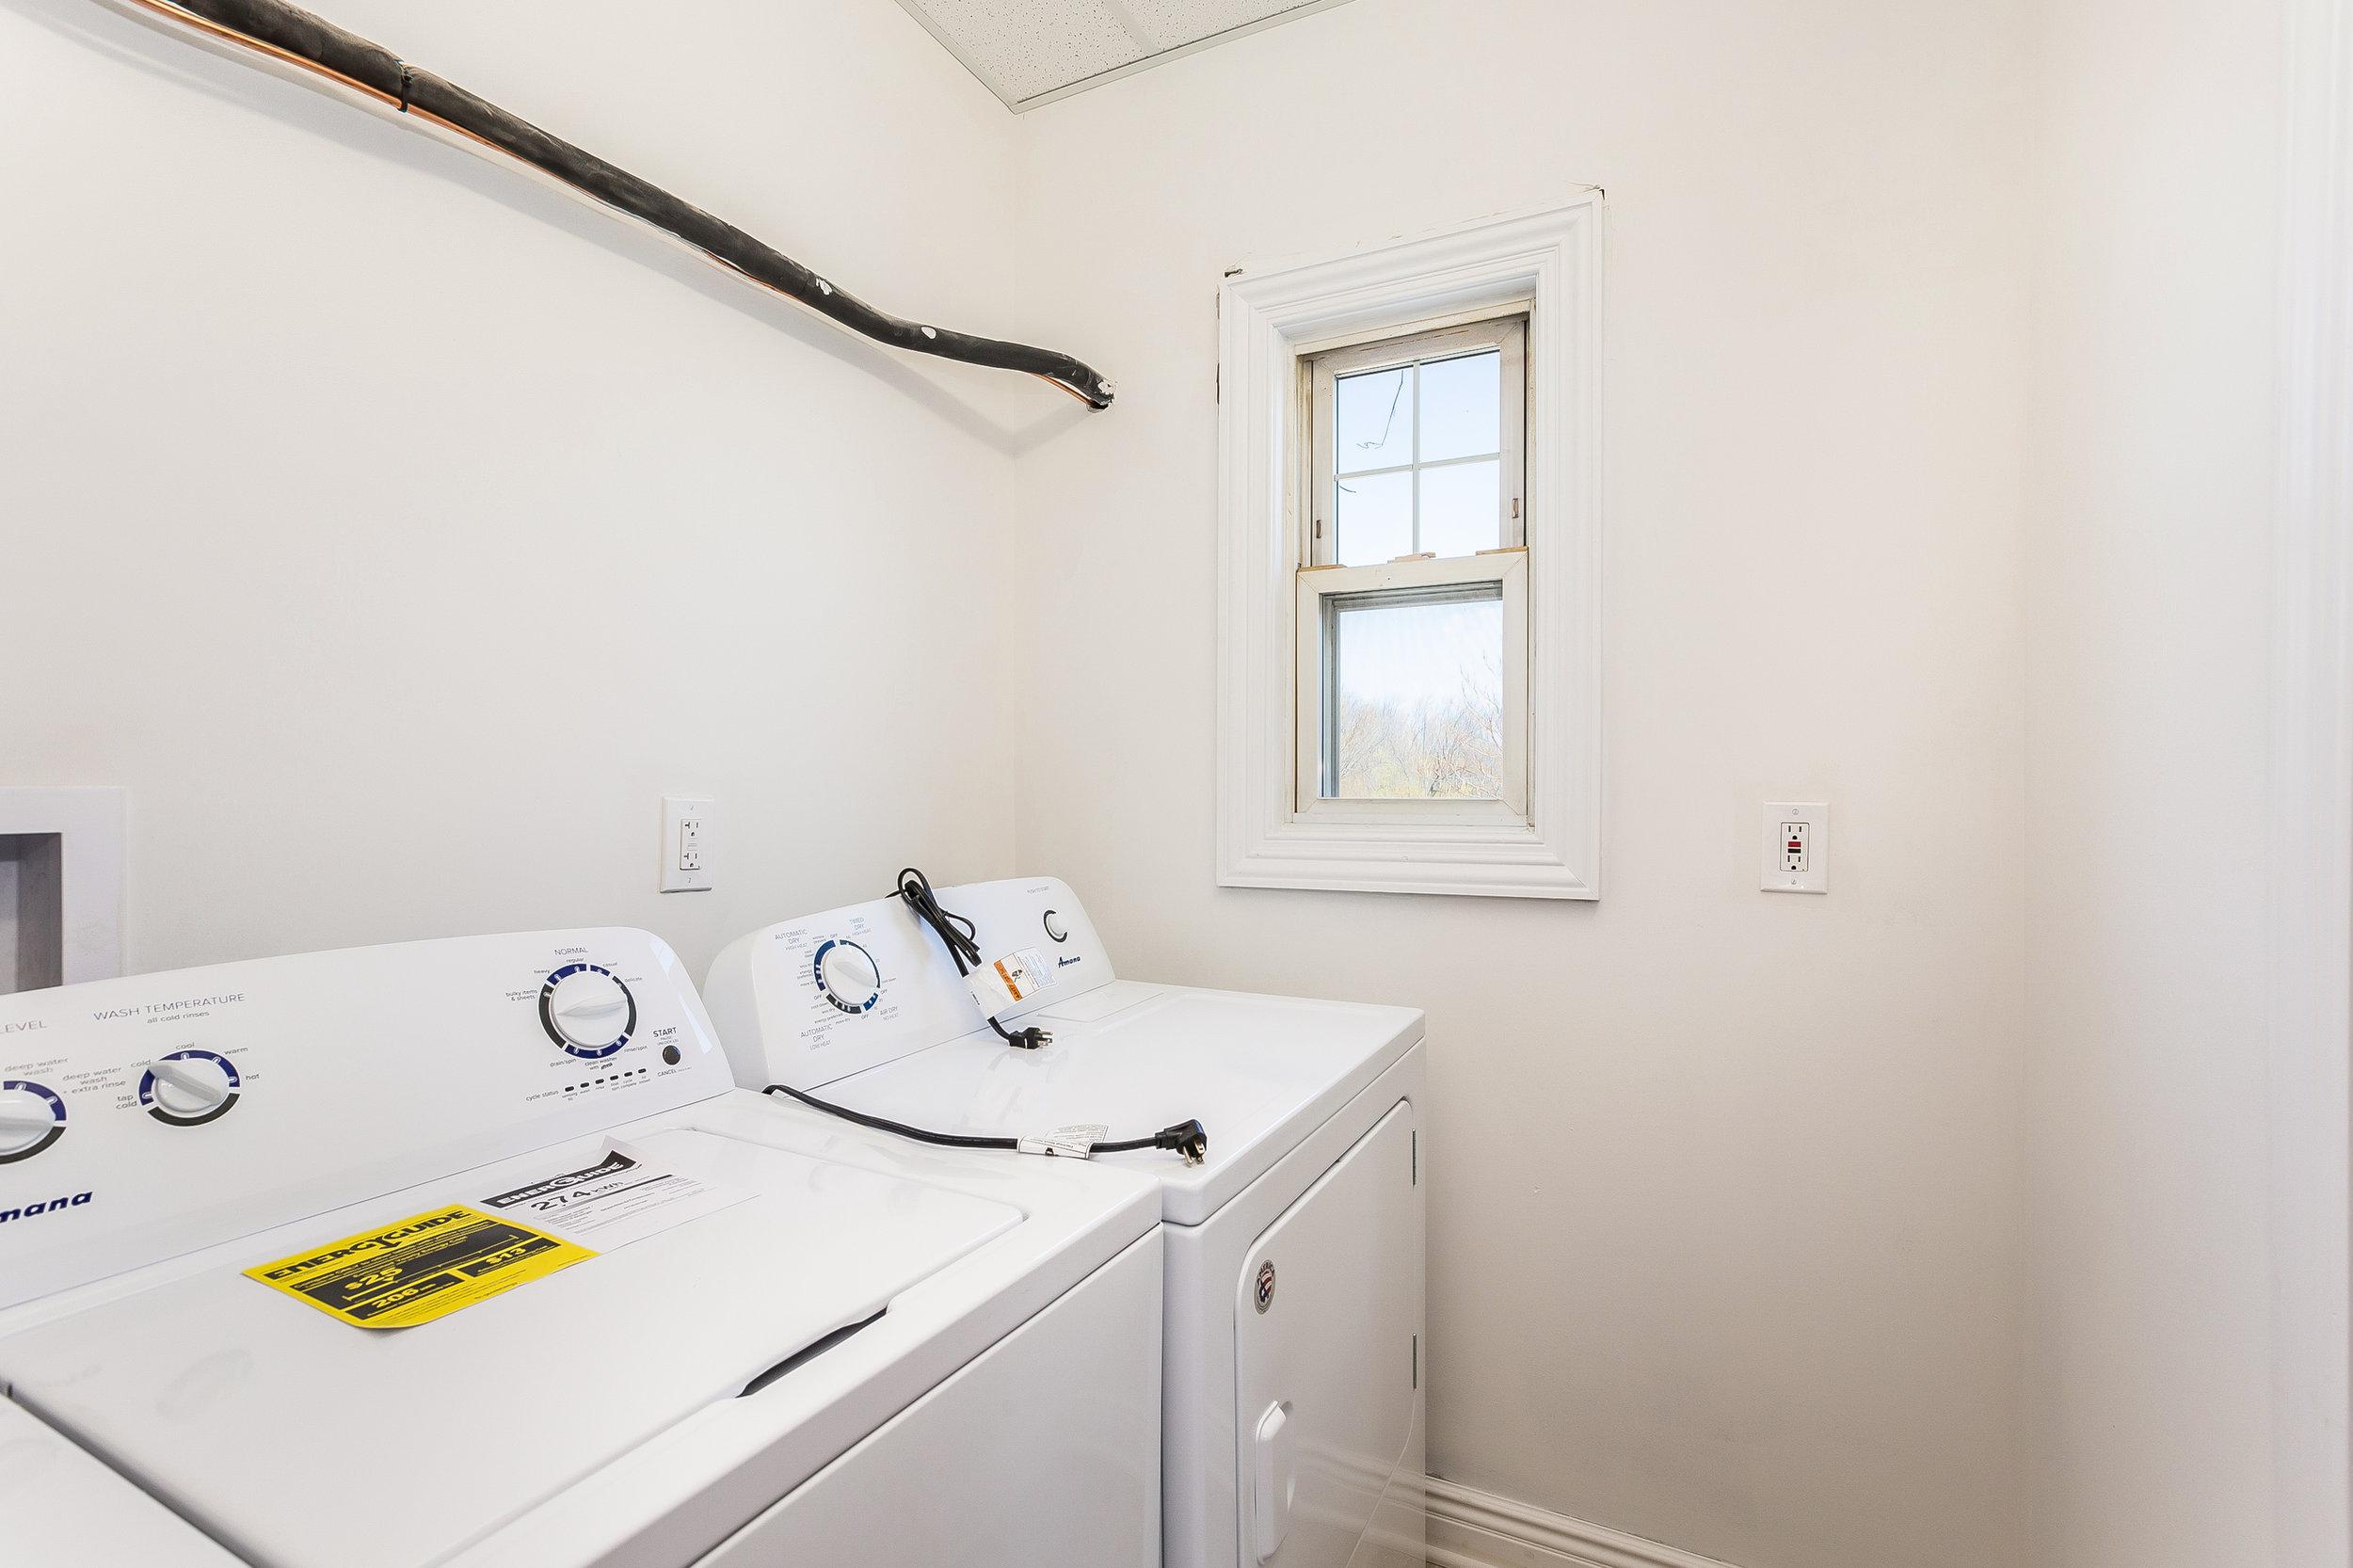 055-Laundry_Room-3992697-large.jpg